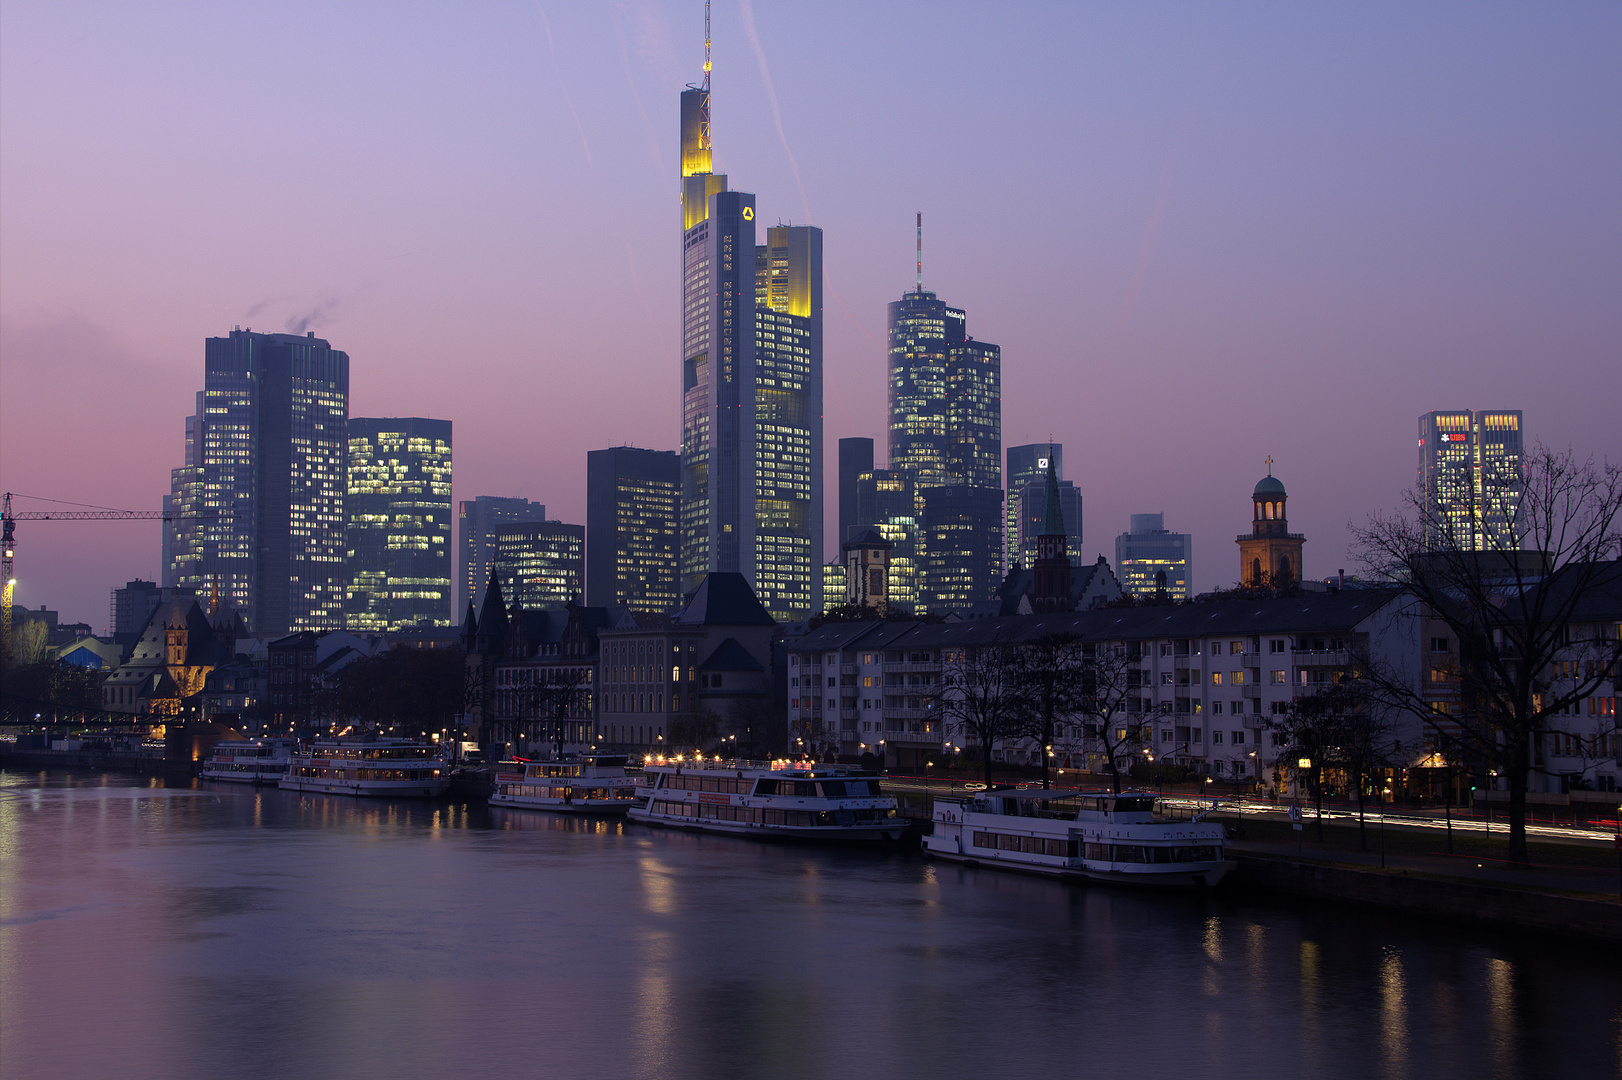 Frankfurt am Main 2